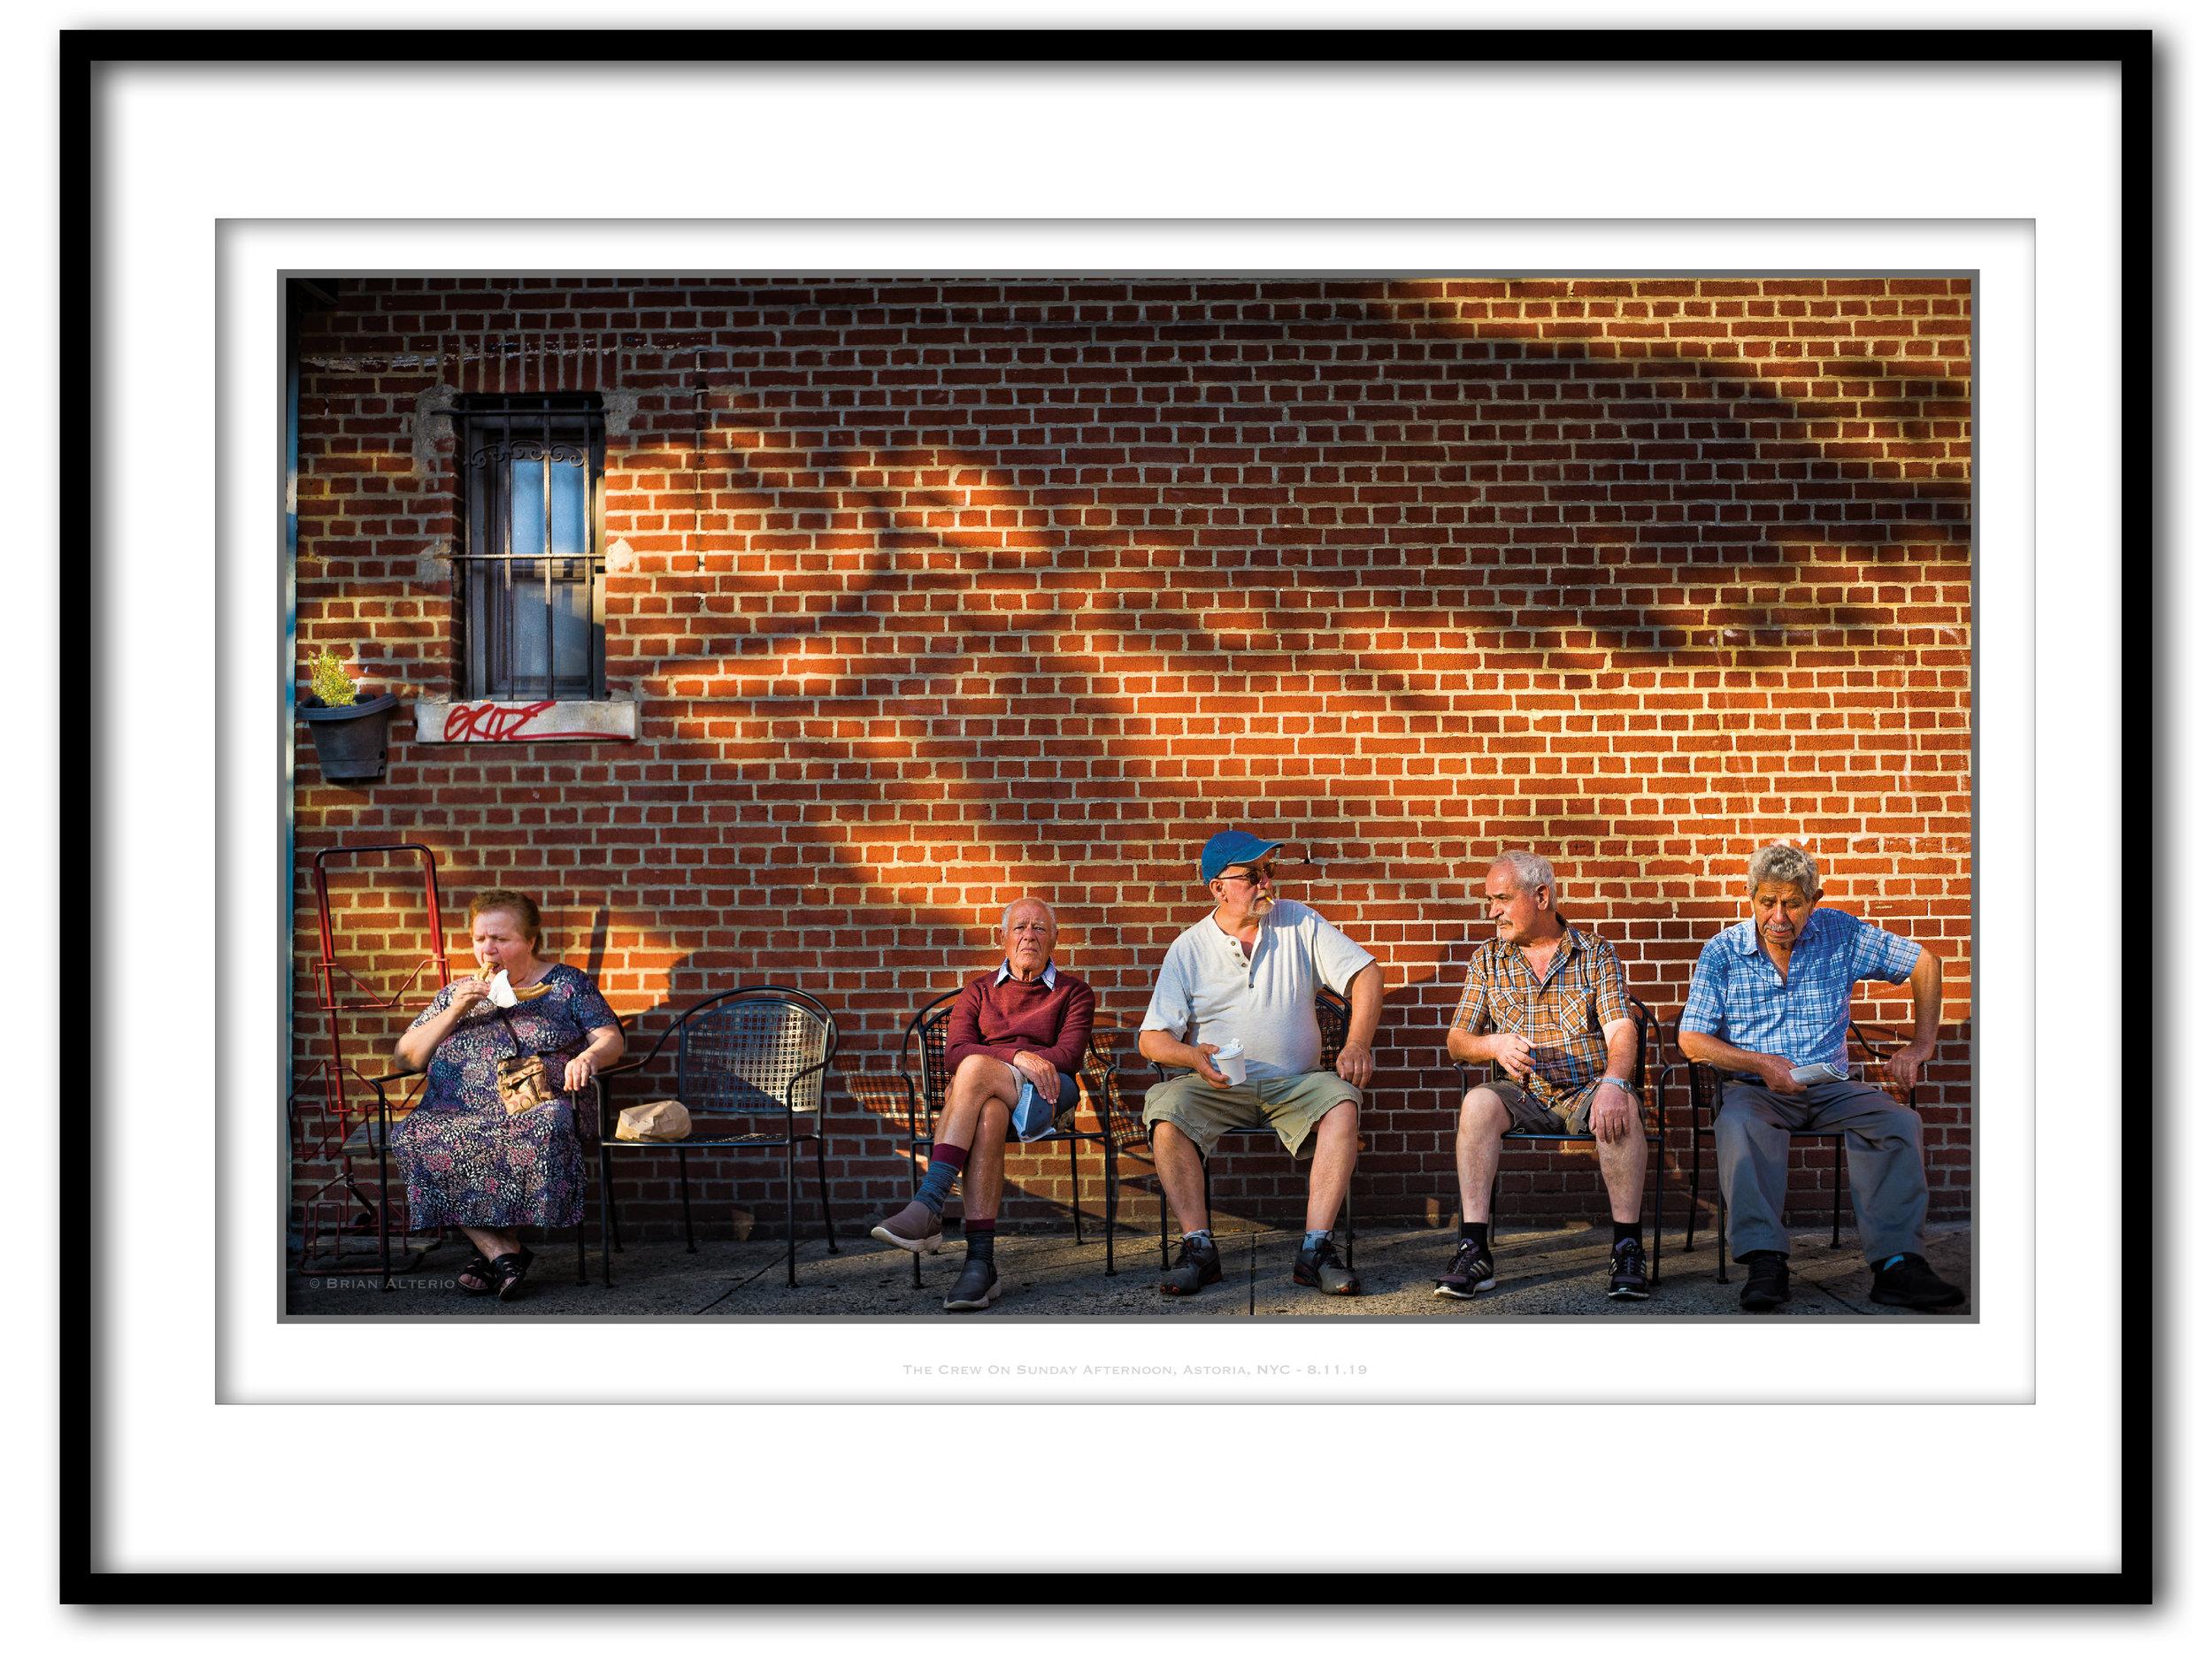 The Crew On Sunday Afternoon, Astoria, NYC - 8.11.19- Framed.jpg